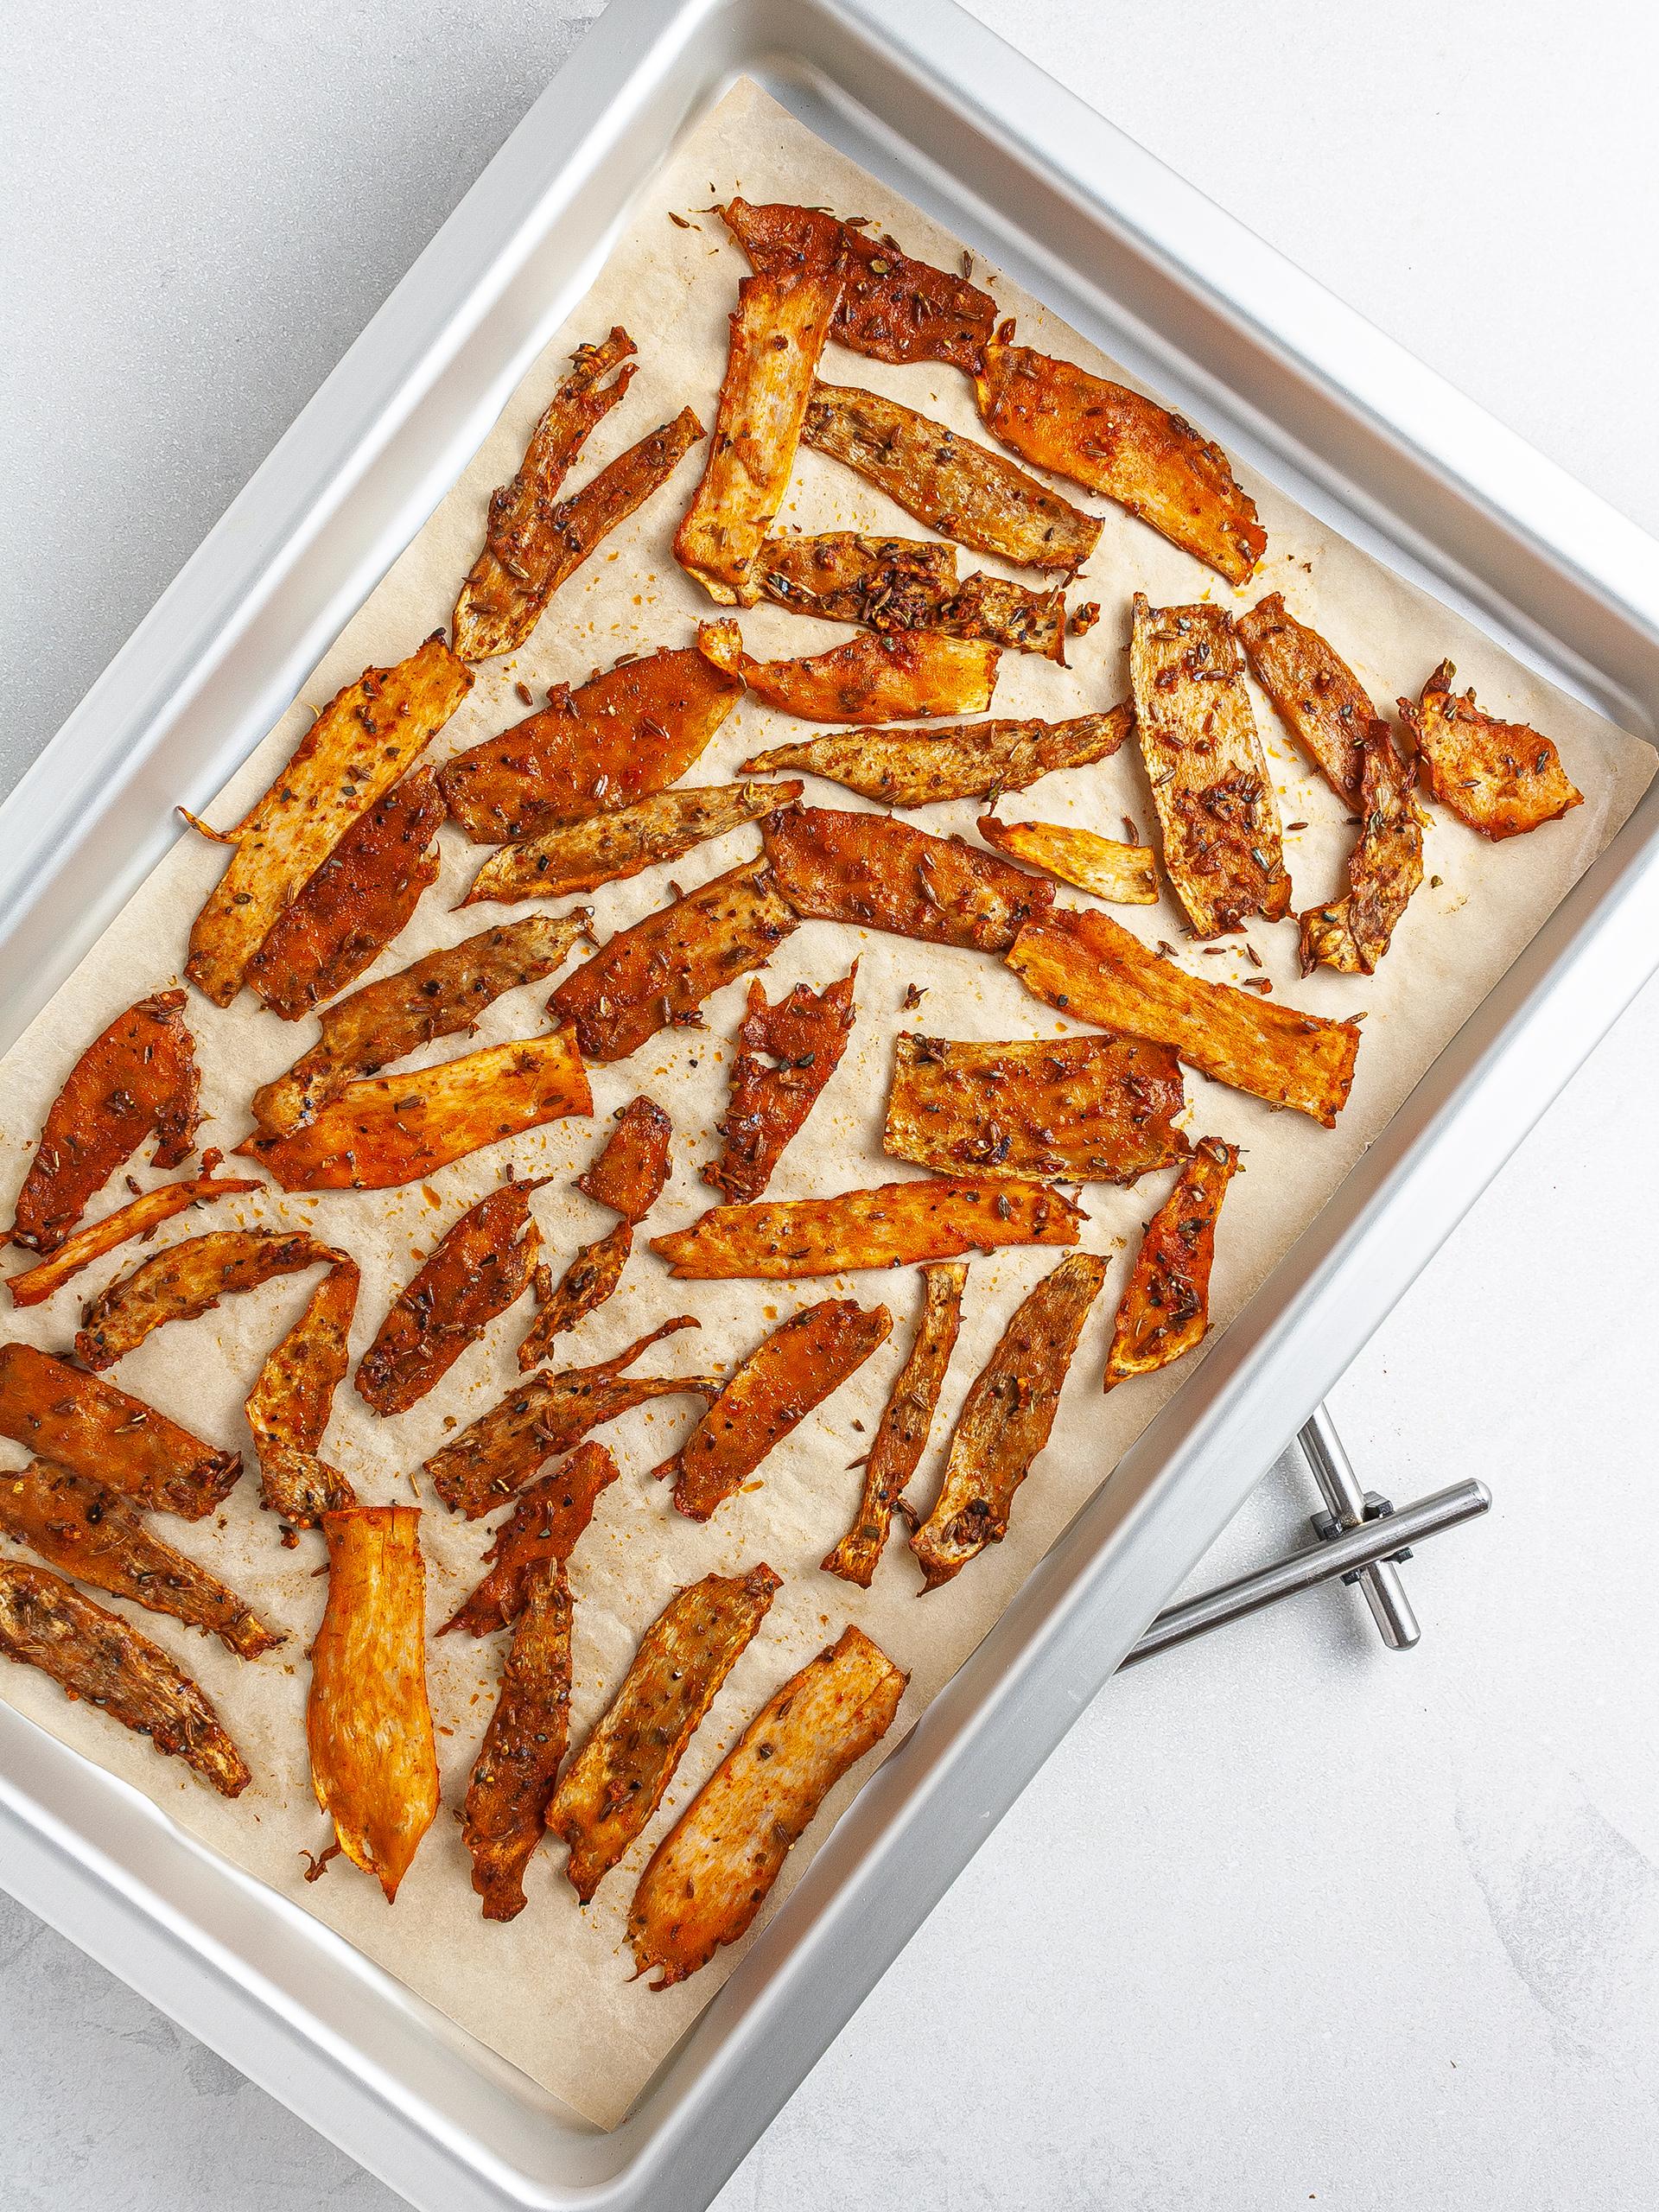 Oven-baked tomato shawarma strips